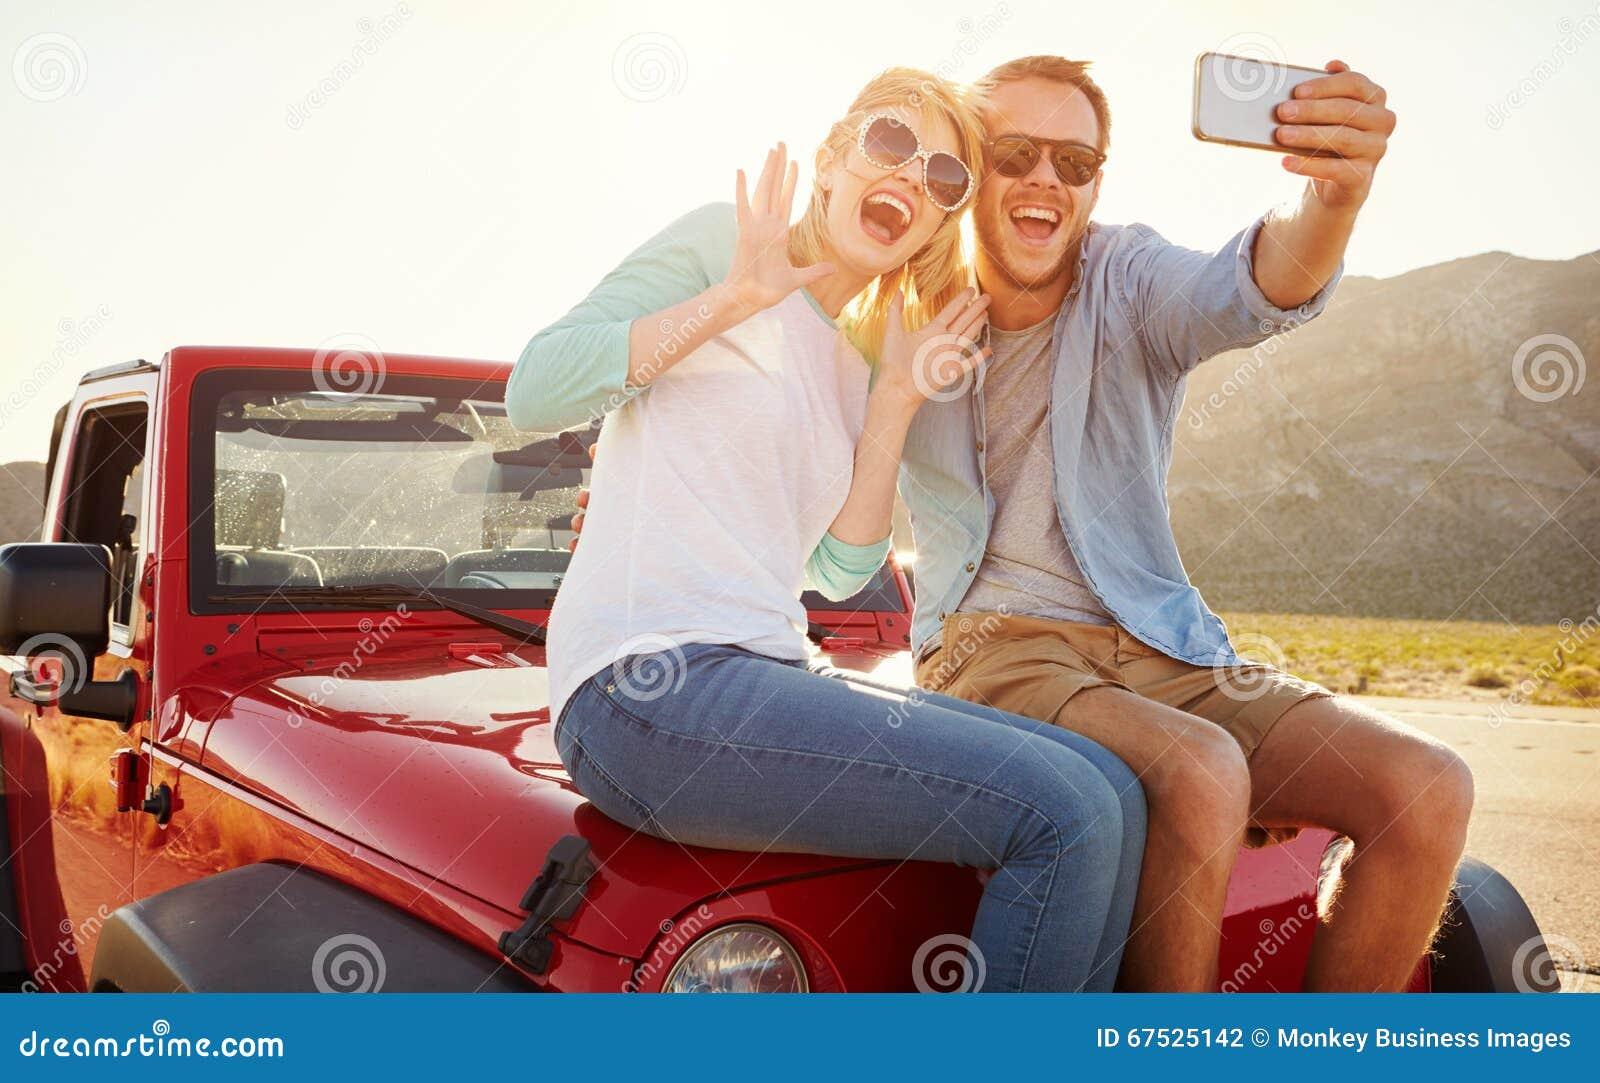 Paare auf Autoreise Sit On Convertible Car Taking Selfie